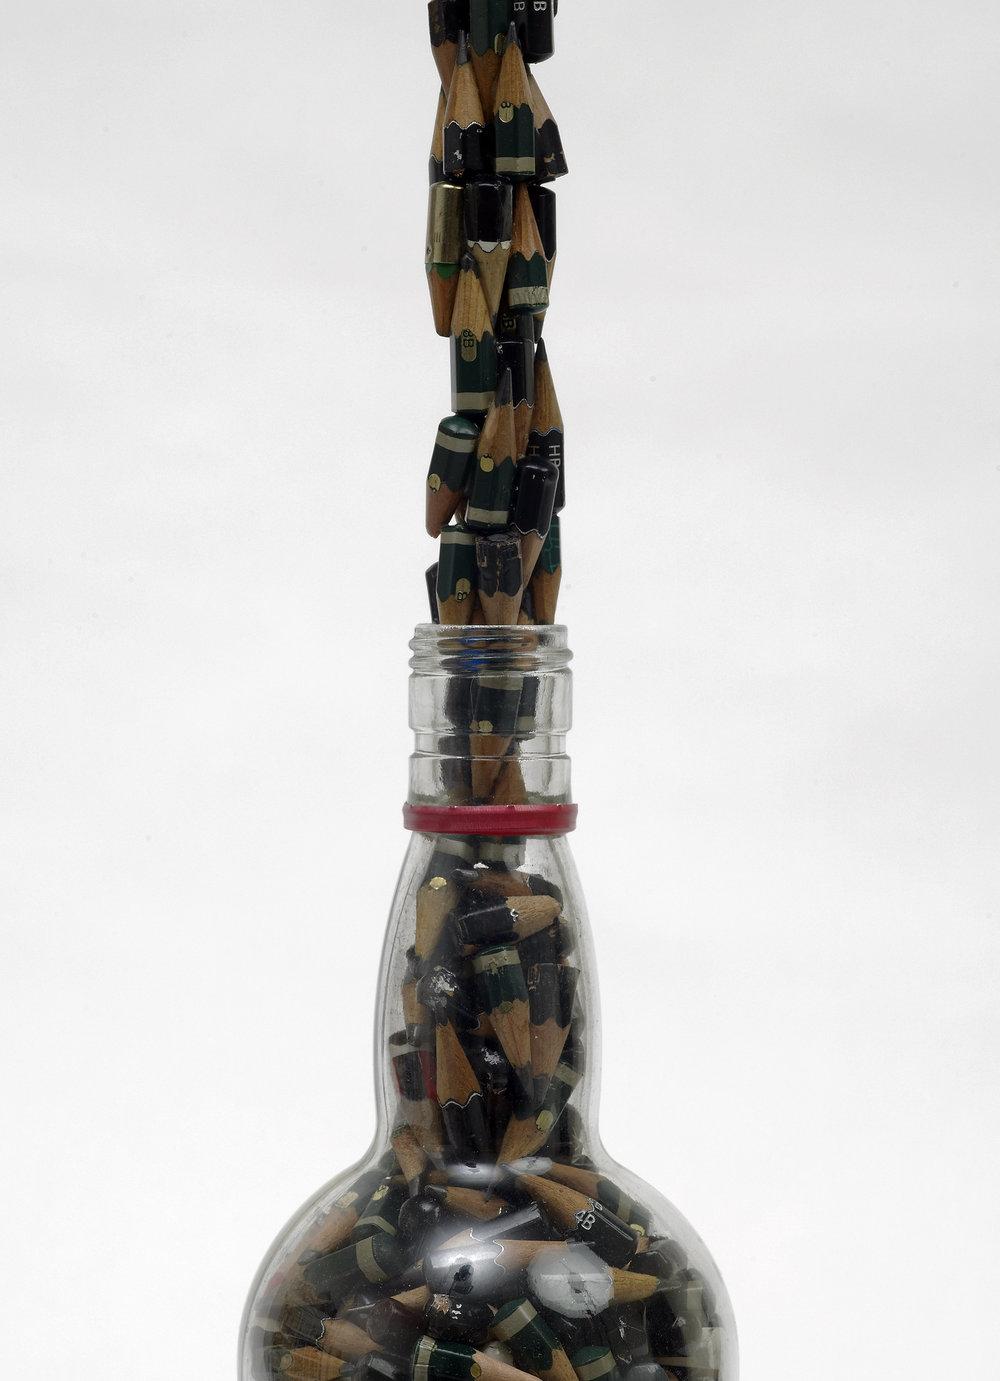 Bottle-and-Used-Pencils,-Vodka-bottle,-pencil-stubs,-glue,-46-x-8.jpg